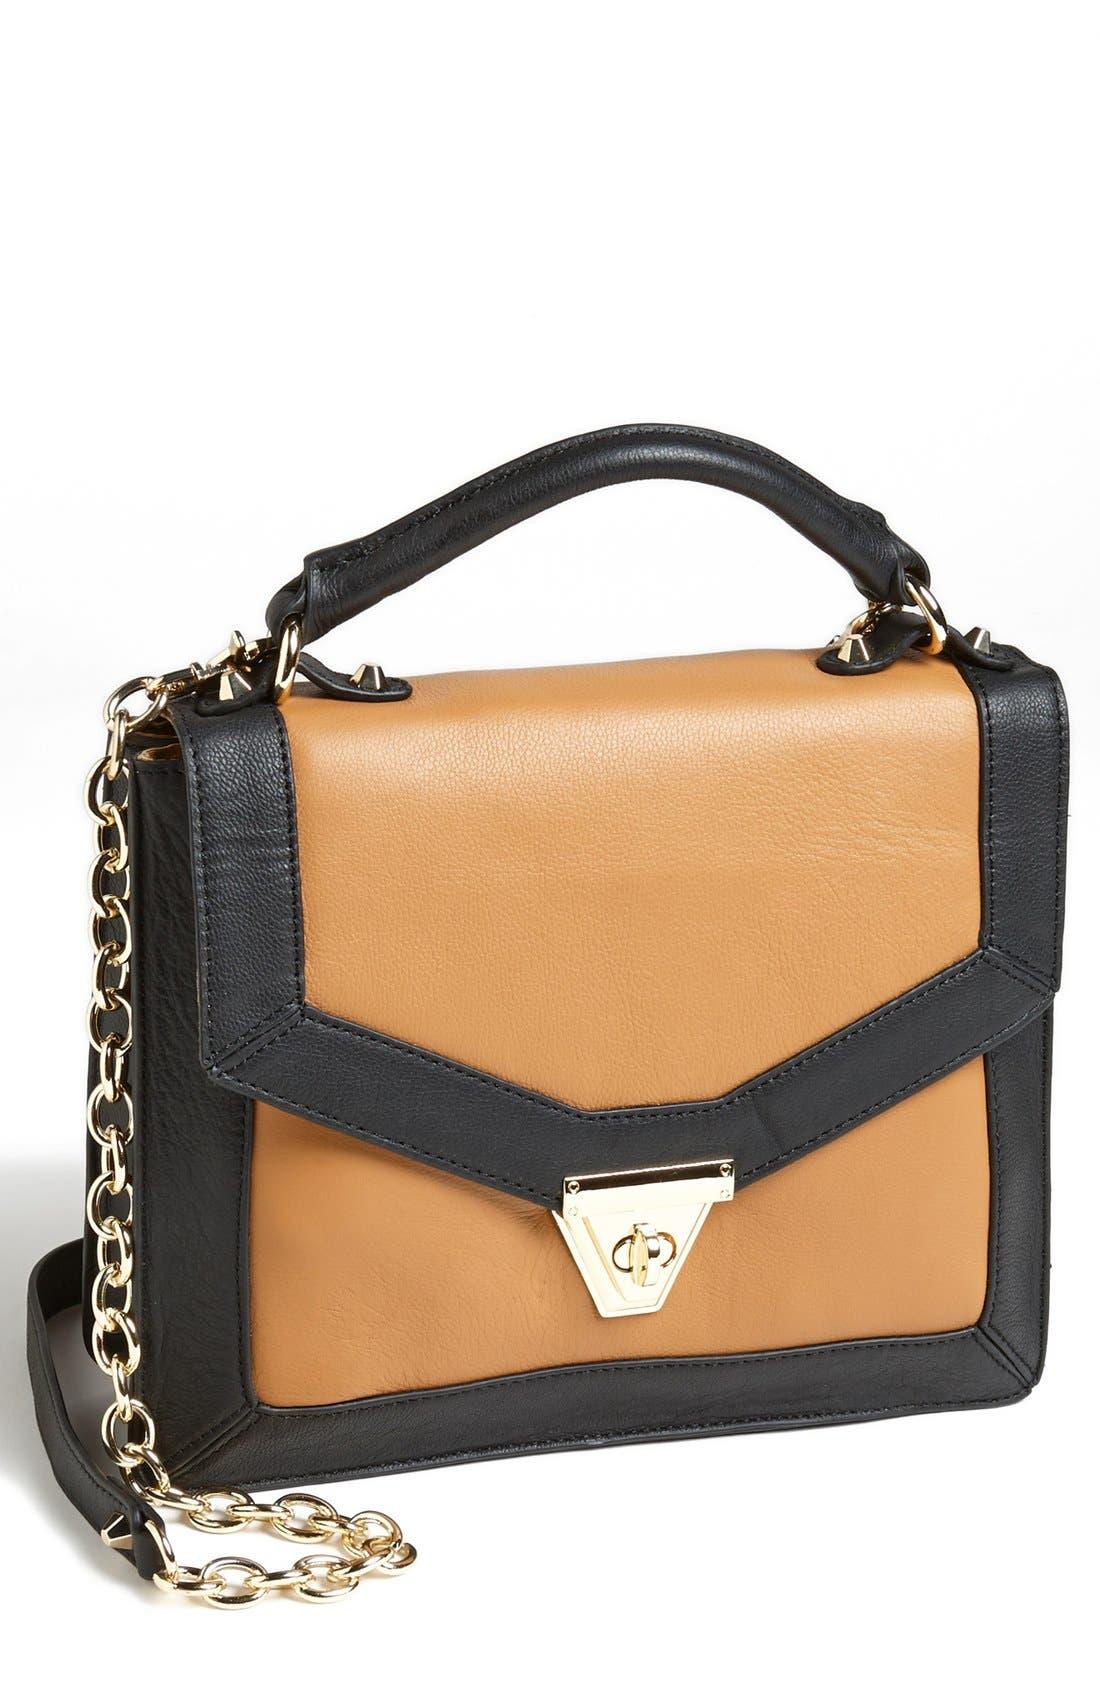 Main Image - Sole Society 'Lisette - Medium' Shoulder Bag